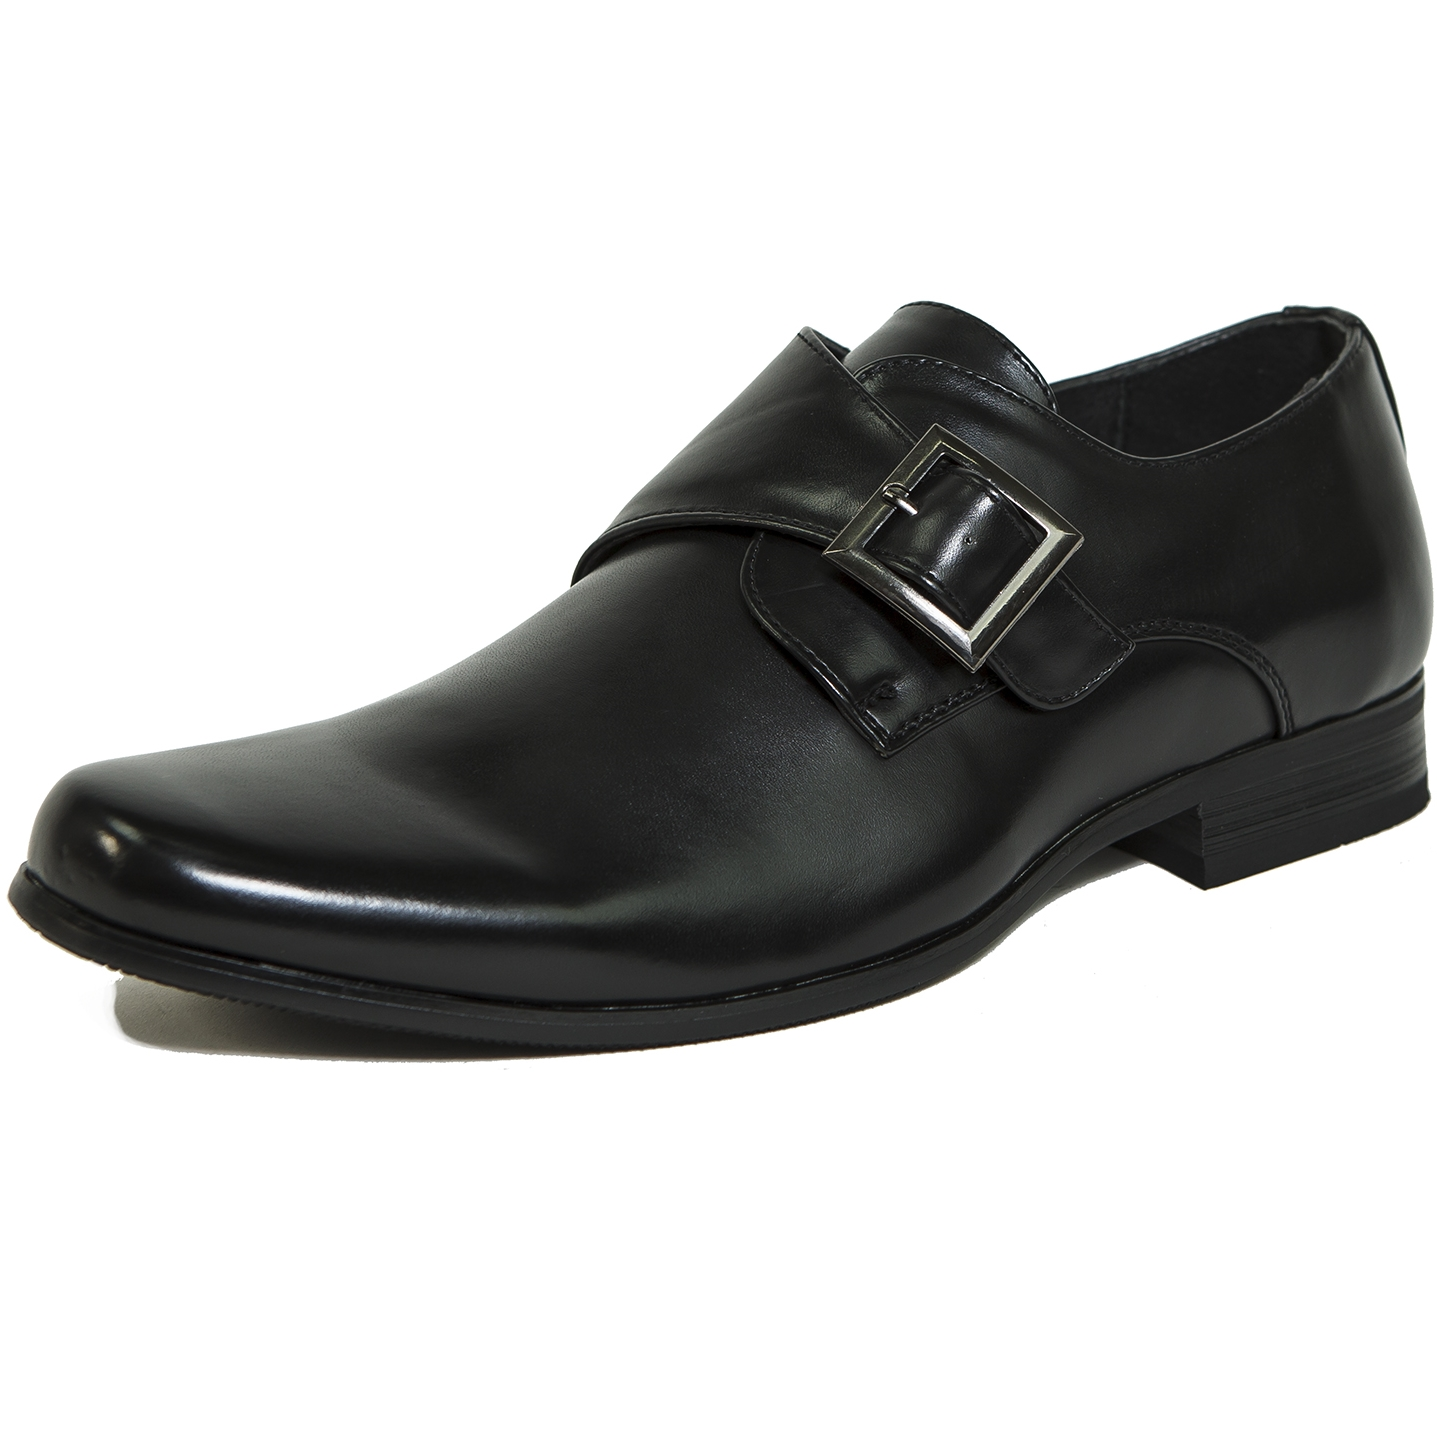 Mens Shoes Buckle Strap